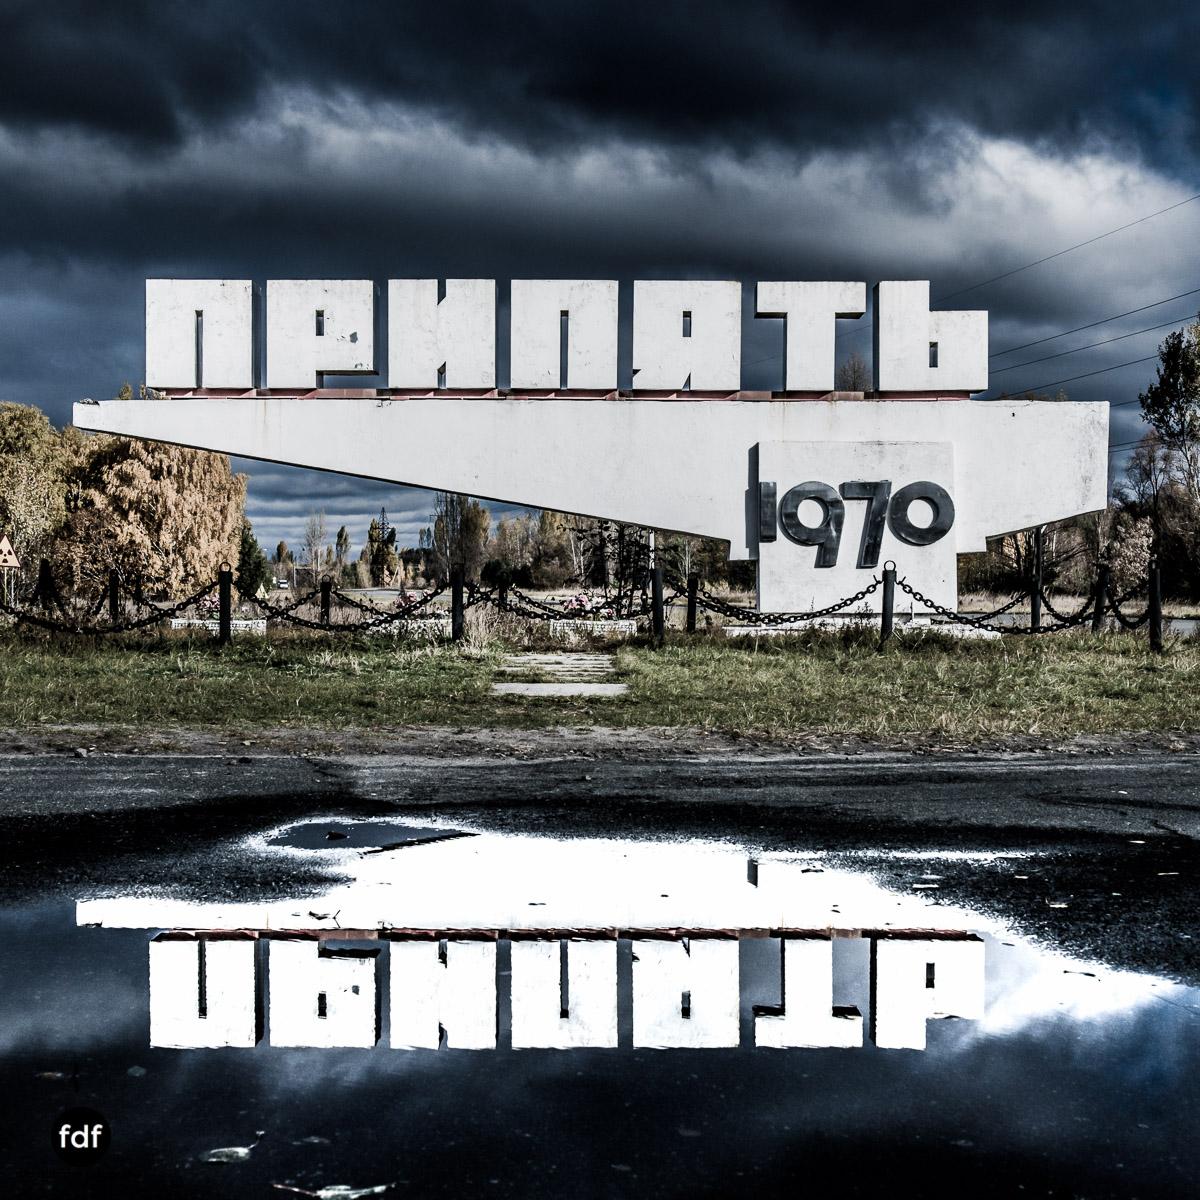 Tschernobyl-Chernobyl-Prypjat-Urbex-Lost-Place-Sperrzone-9.jpg